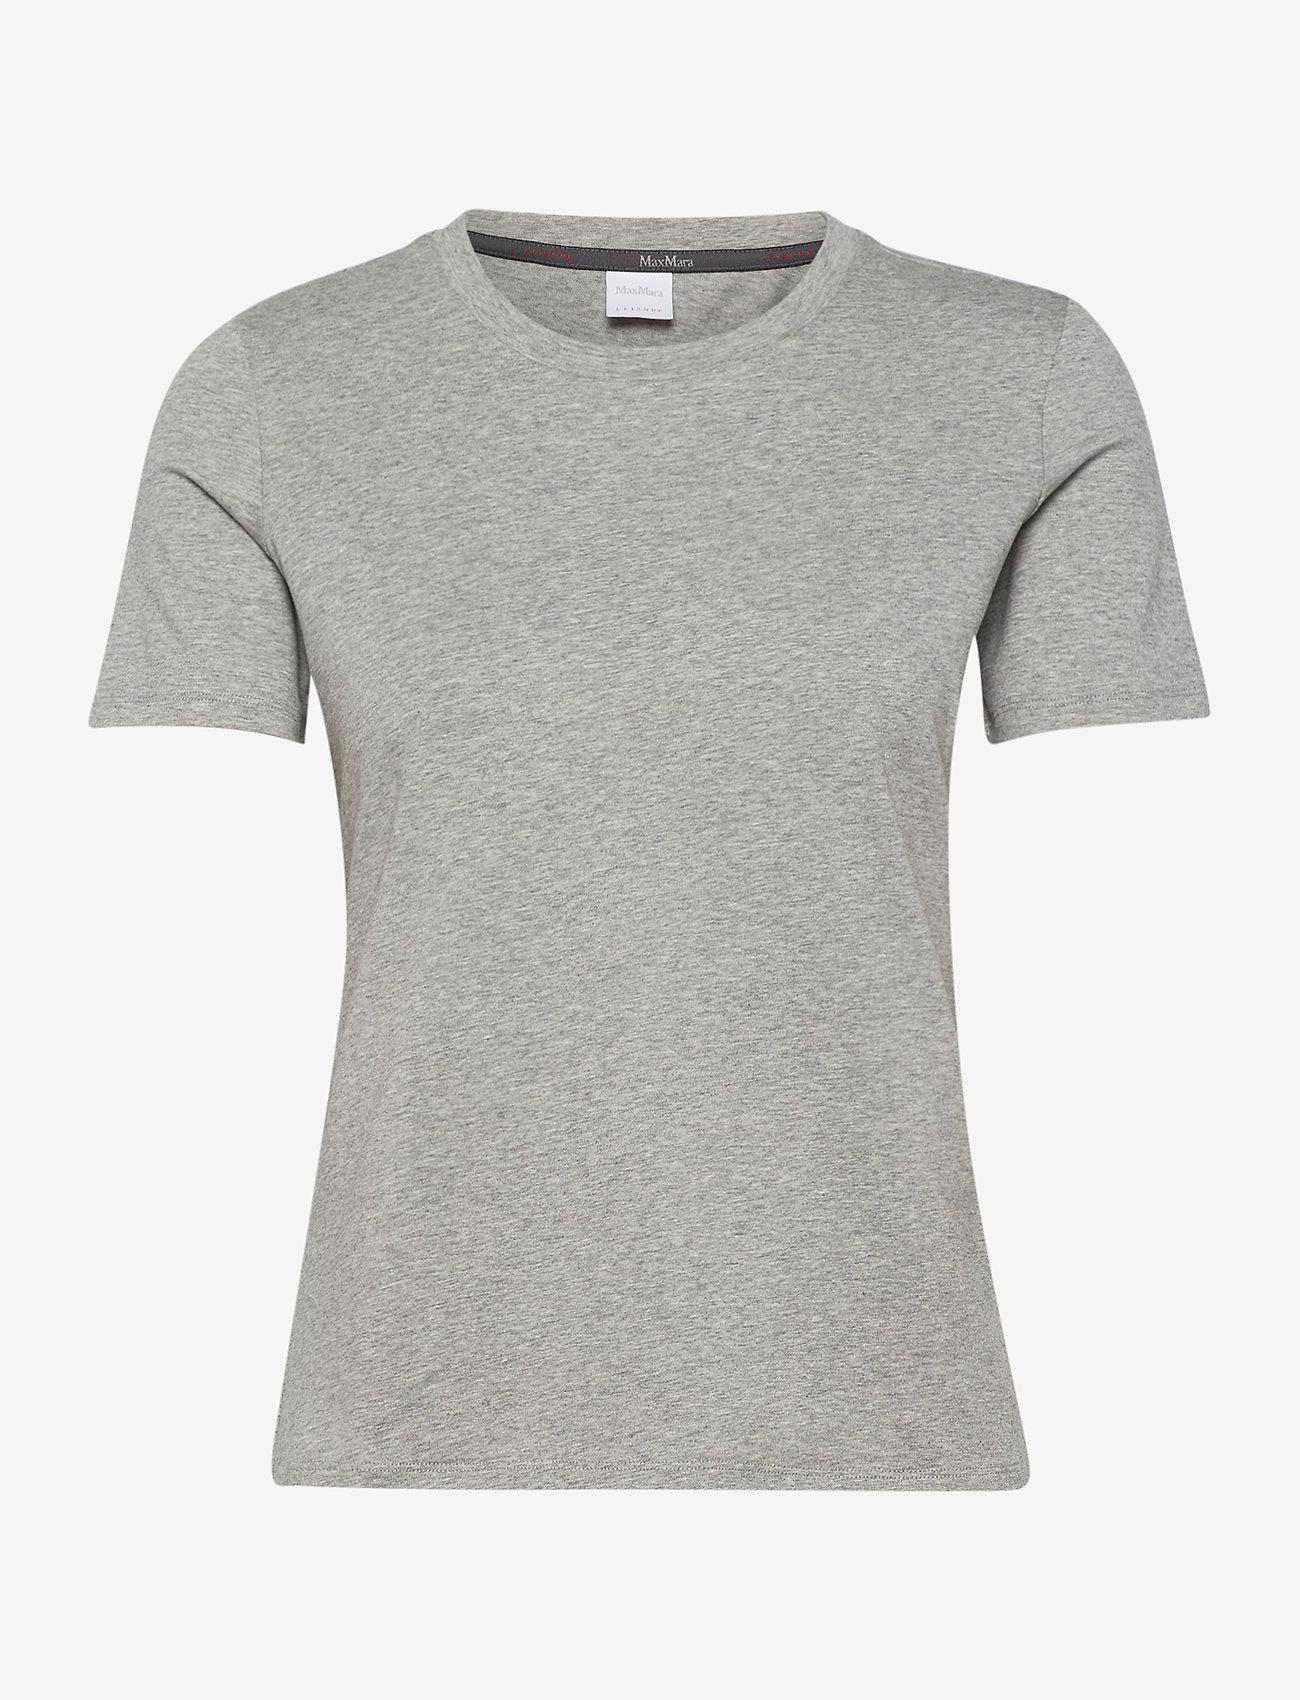 Max Mara Leisure - VAGARE - t-shirts - light grey - 0